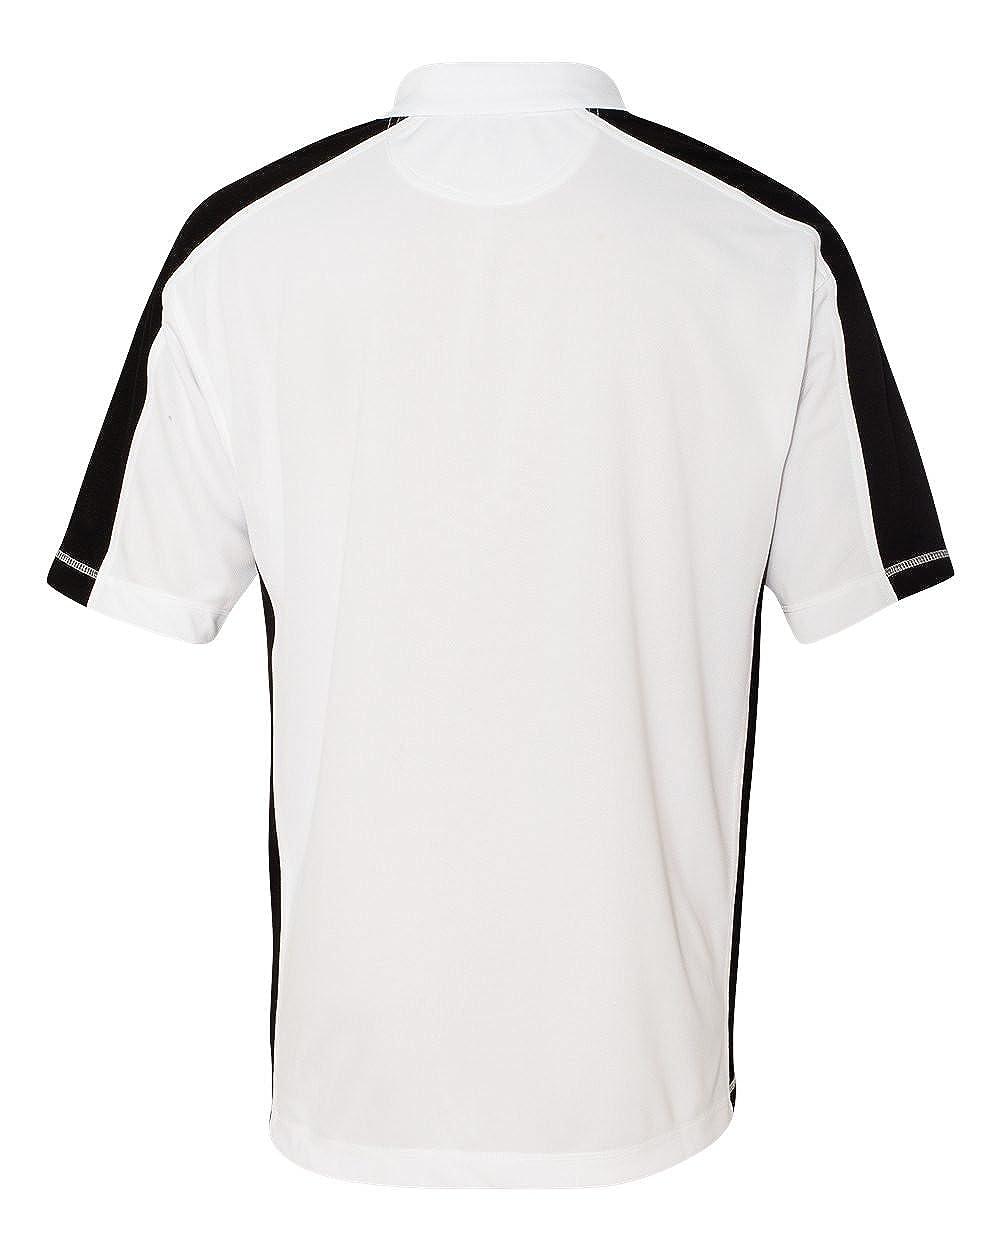 FeatherLite Colorblocked Moisture Free Mesh Sport Shirt 0465